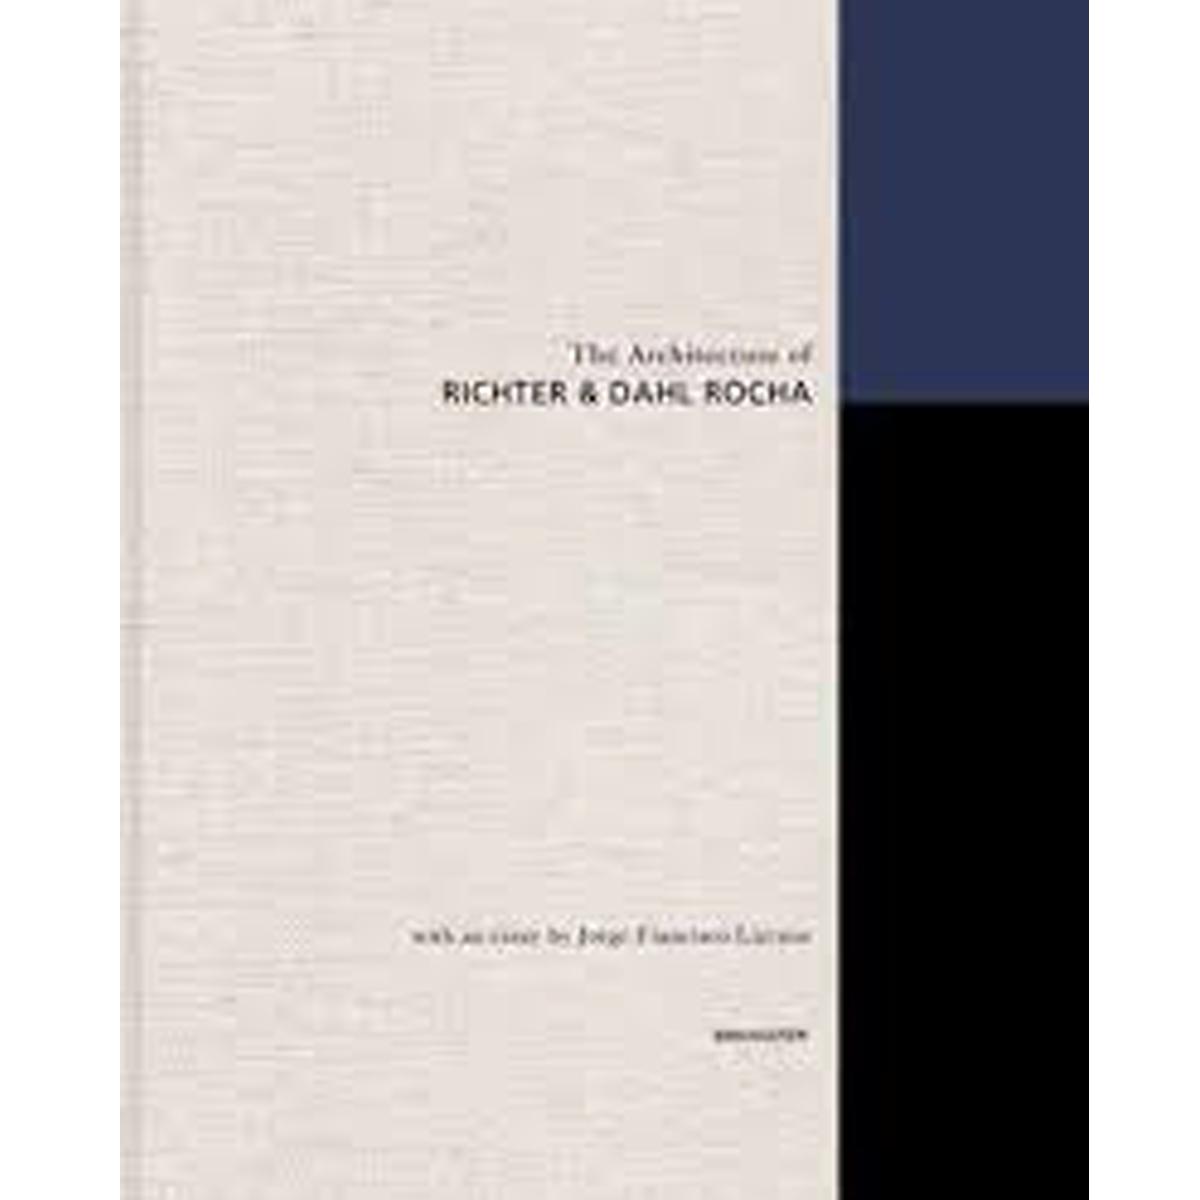 The Architecture of Richter & Dahl Rocha